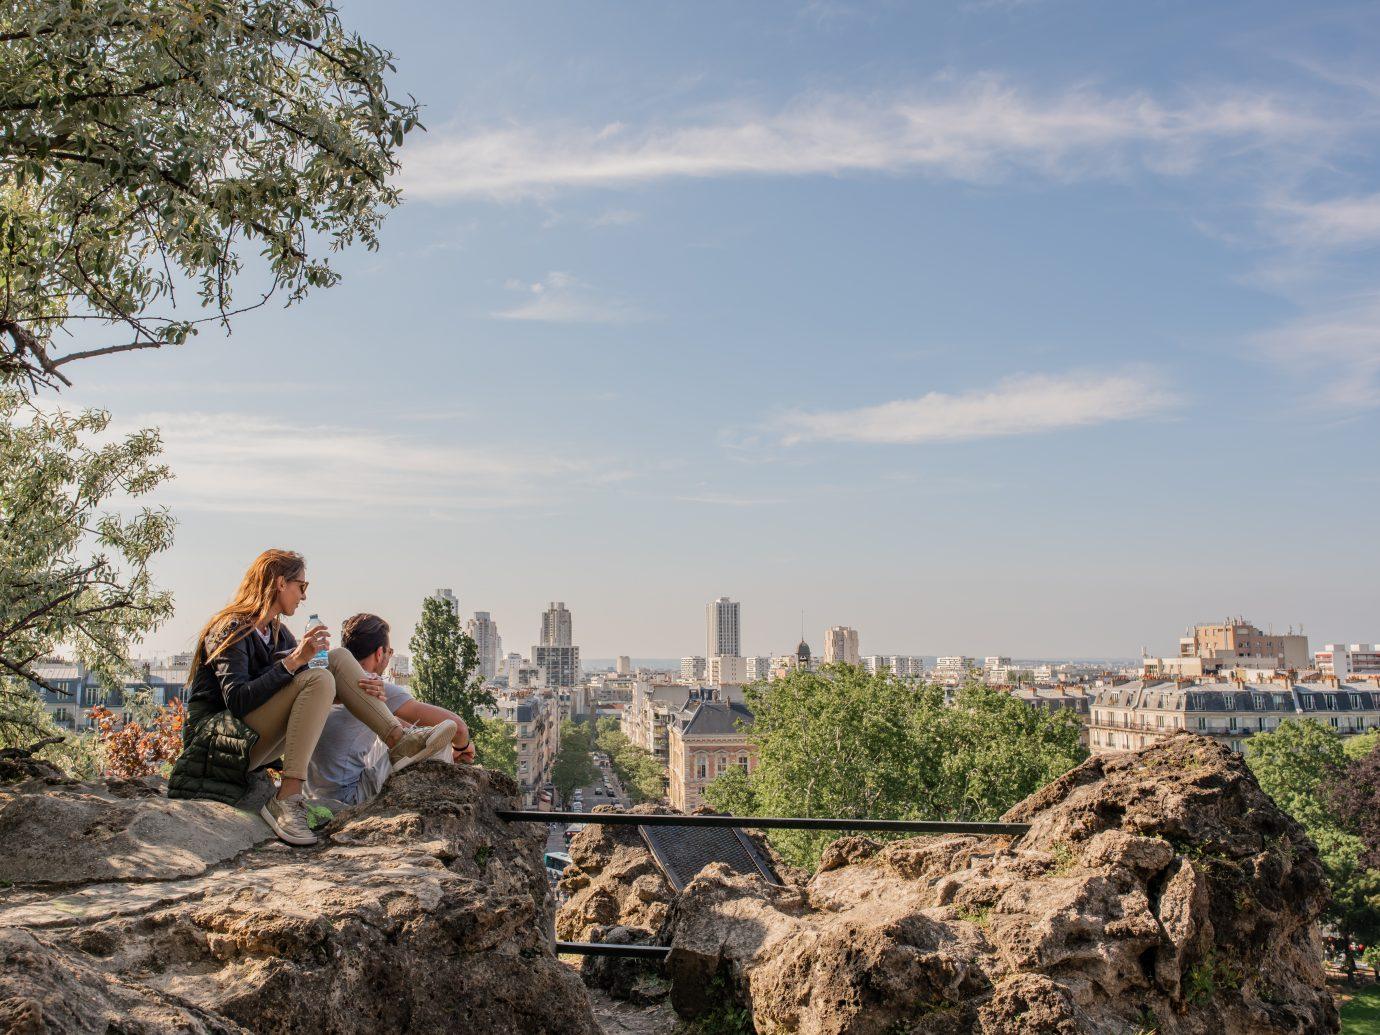 Friends climb a rock on a hill in Parc des Buttes Chaumont